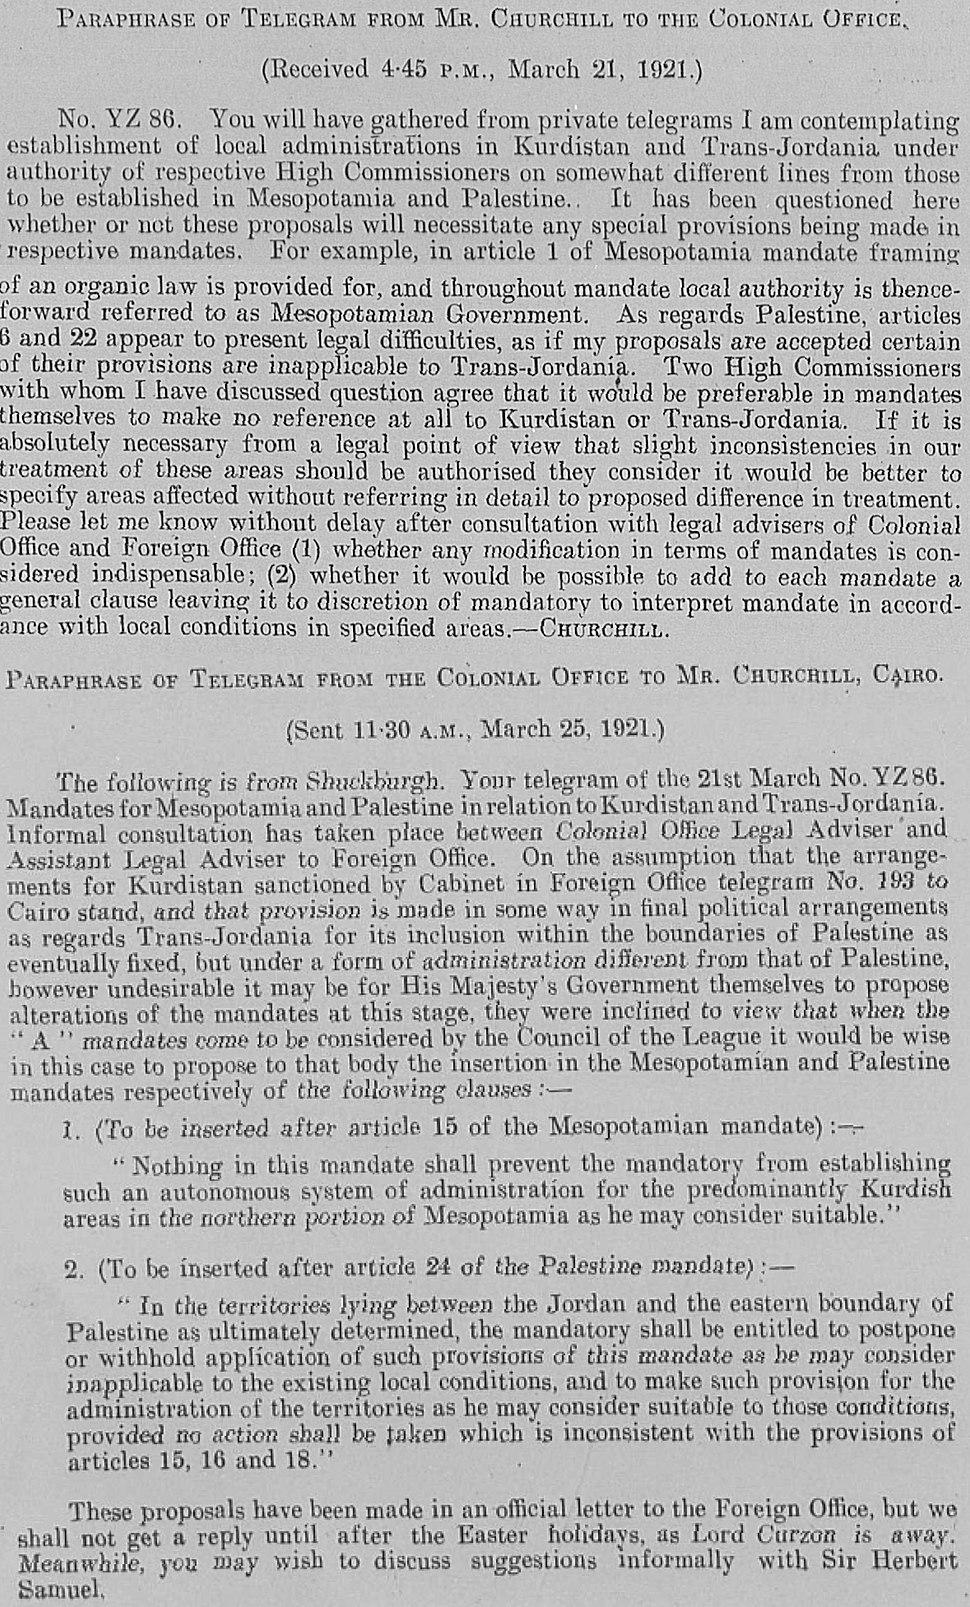 British Government memoranda regarding Article 25 of the Palestine Mandate with respect to Transjordan, March 1921